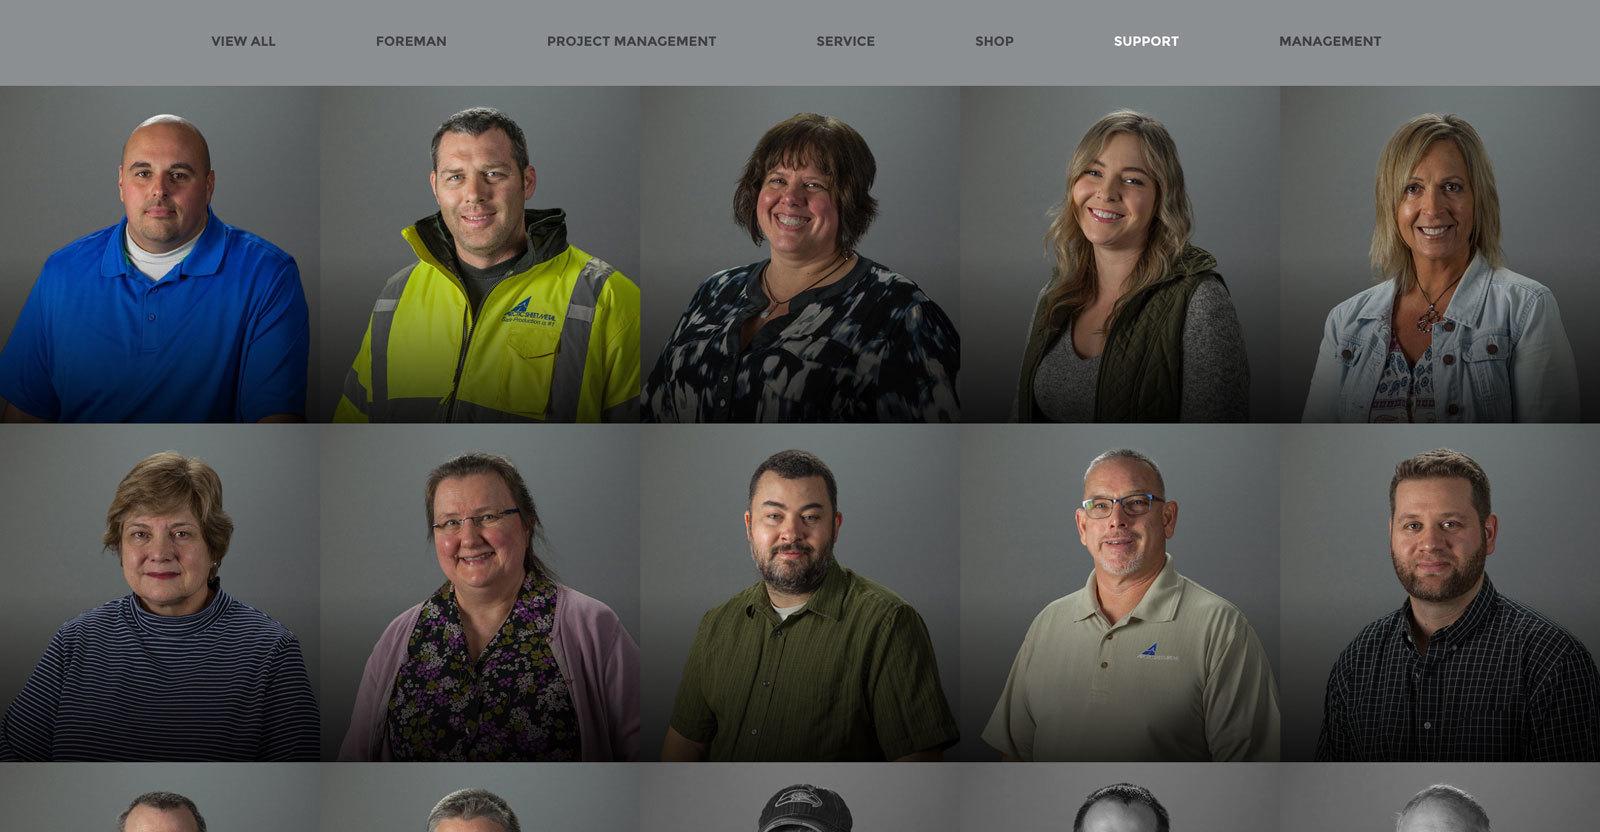 Arctic Sheet Metal - Support Staff Team Members